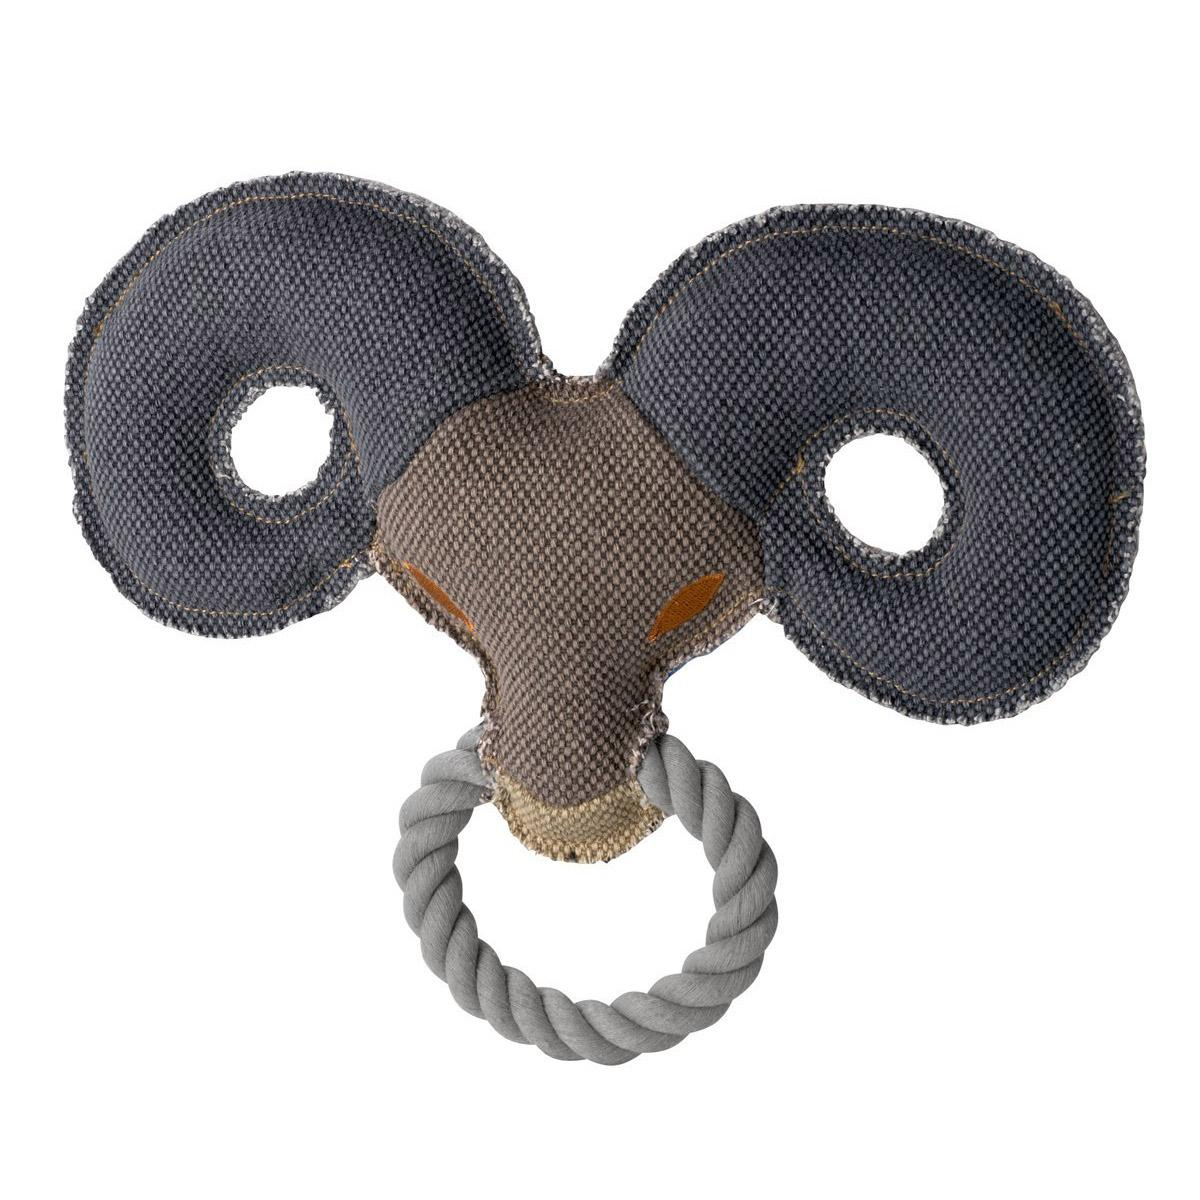 HUNTER Canvas Ring Dog Toy - Sheep